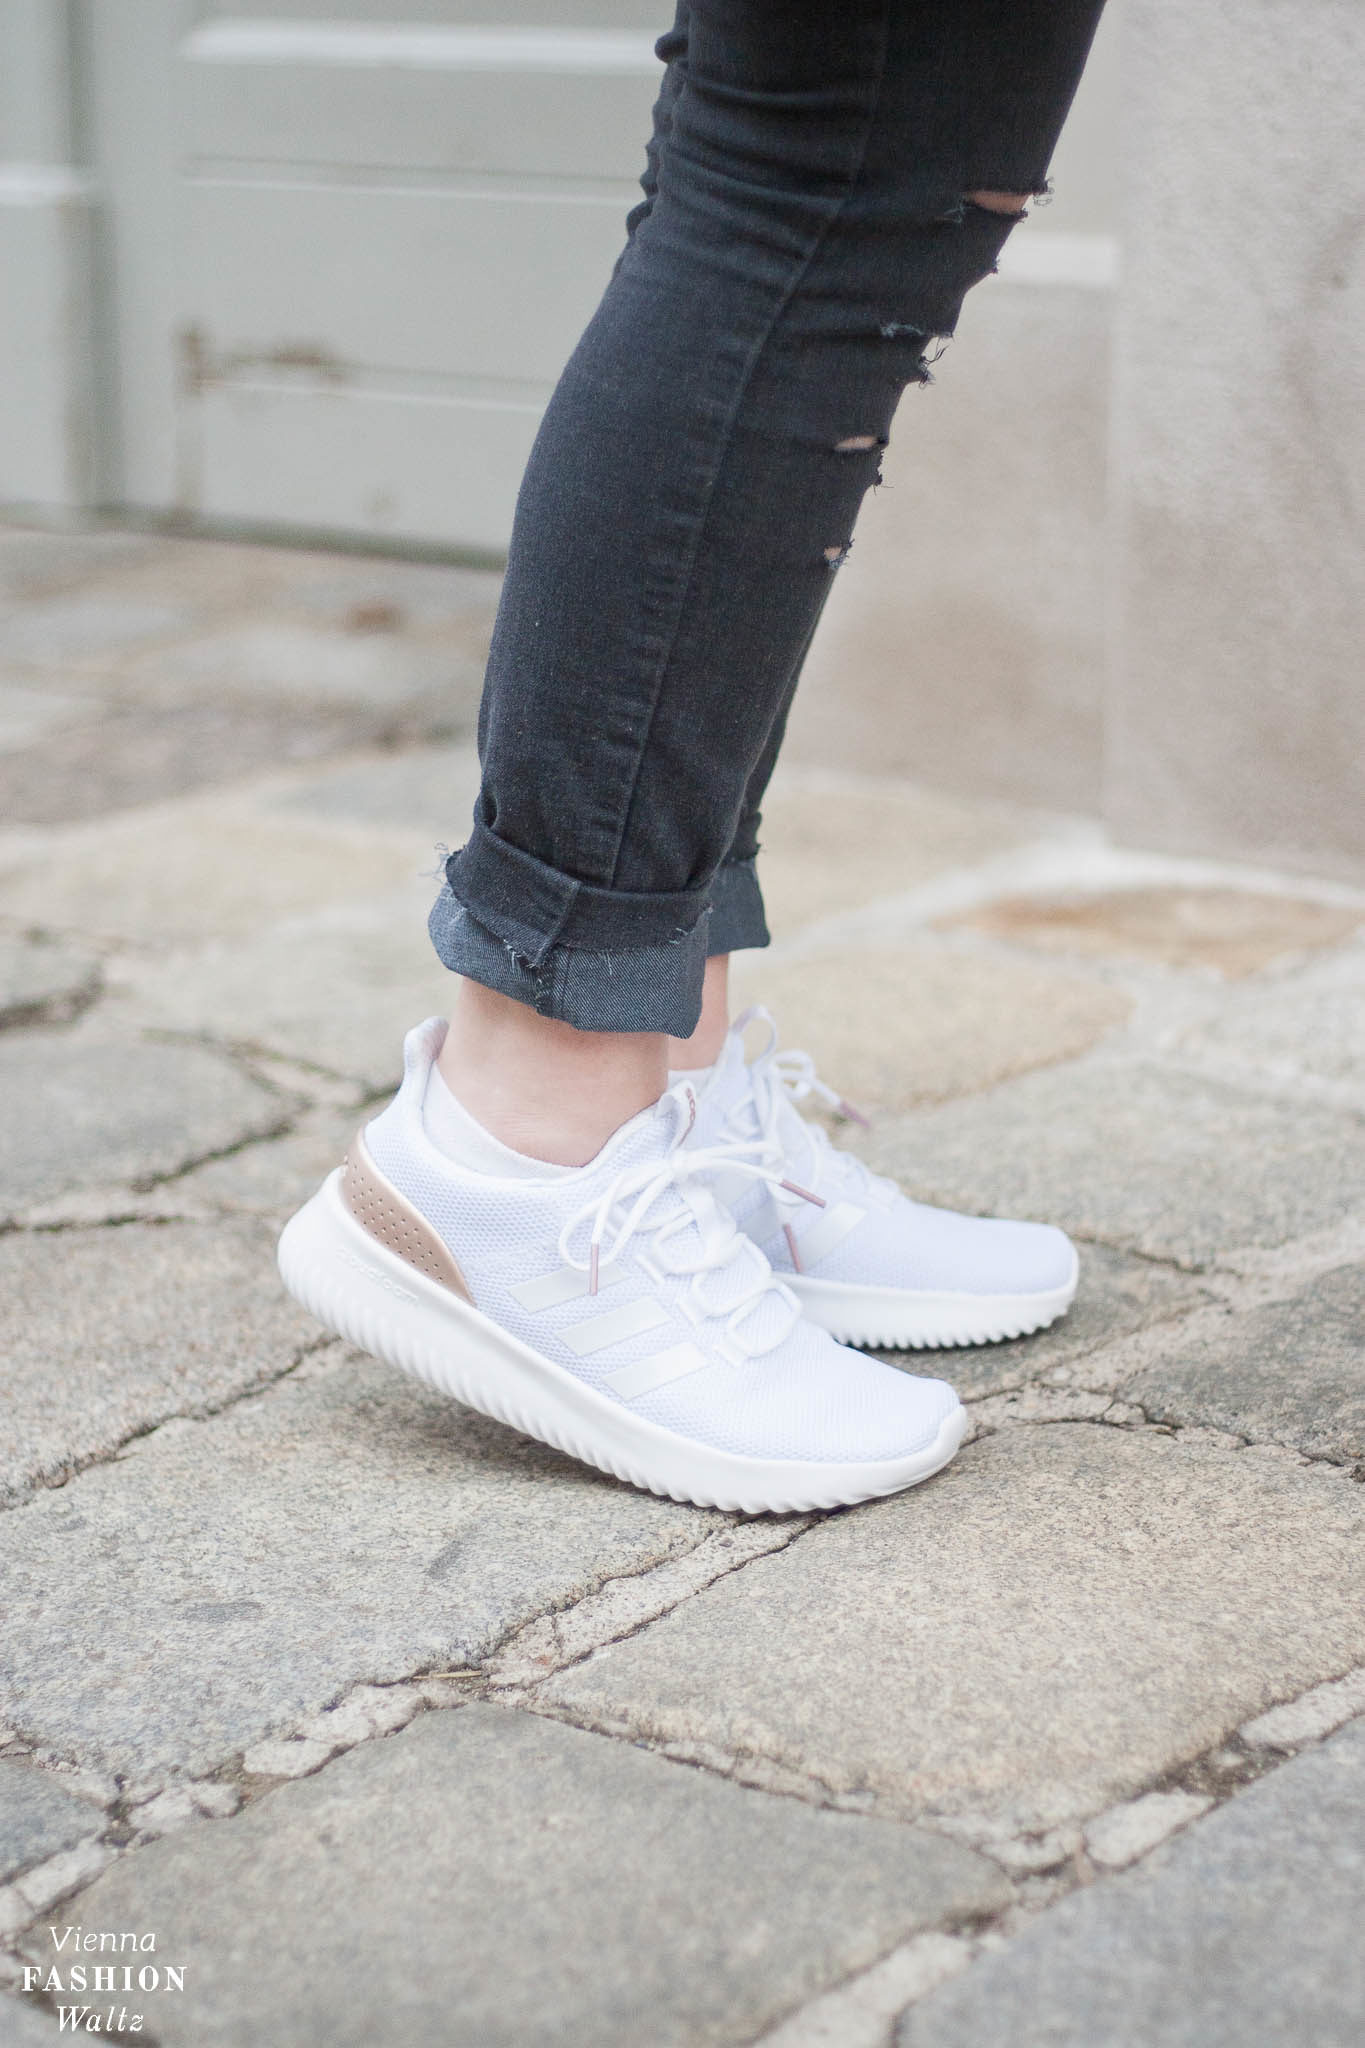 Oversized Wollpulli & Jeans mit Statement Sneakers von Adidas, Streetstyle, Vienna, Outfit, Trends, Second Hand Pulli